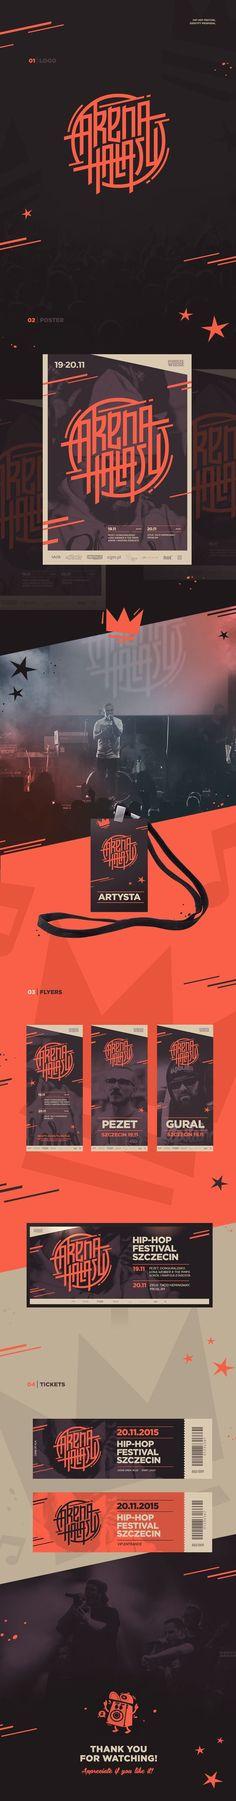 Arena Halasu Hip Hop Festival Branding by Piotr Kubicki | Fivestar Branding – Design and Branding Agency & Inspiration Gallery | Professional Logo and Website Design